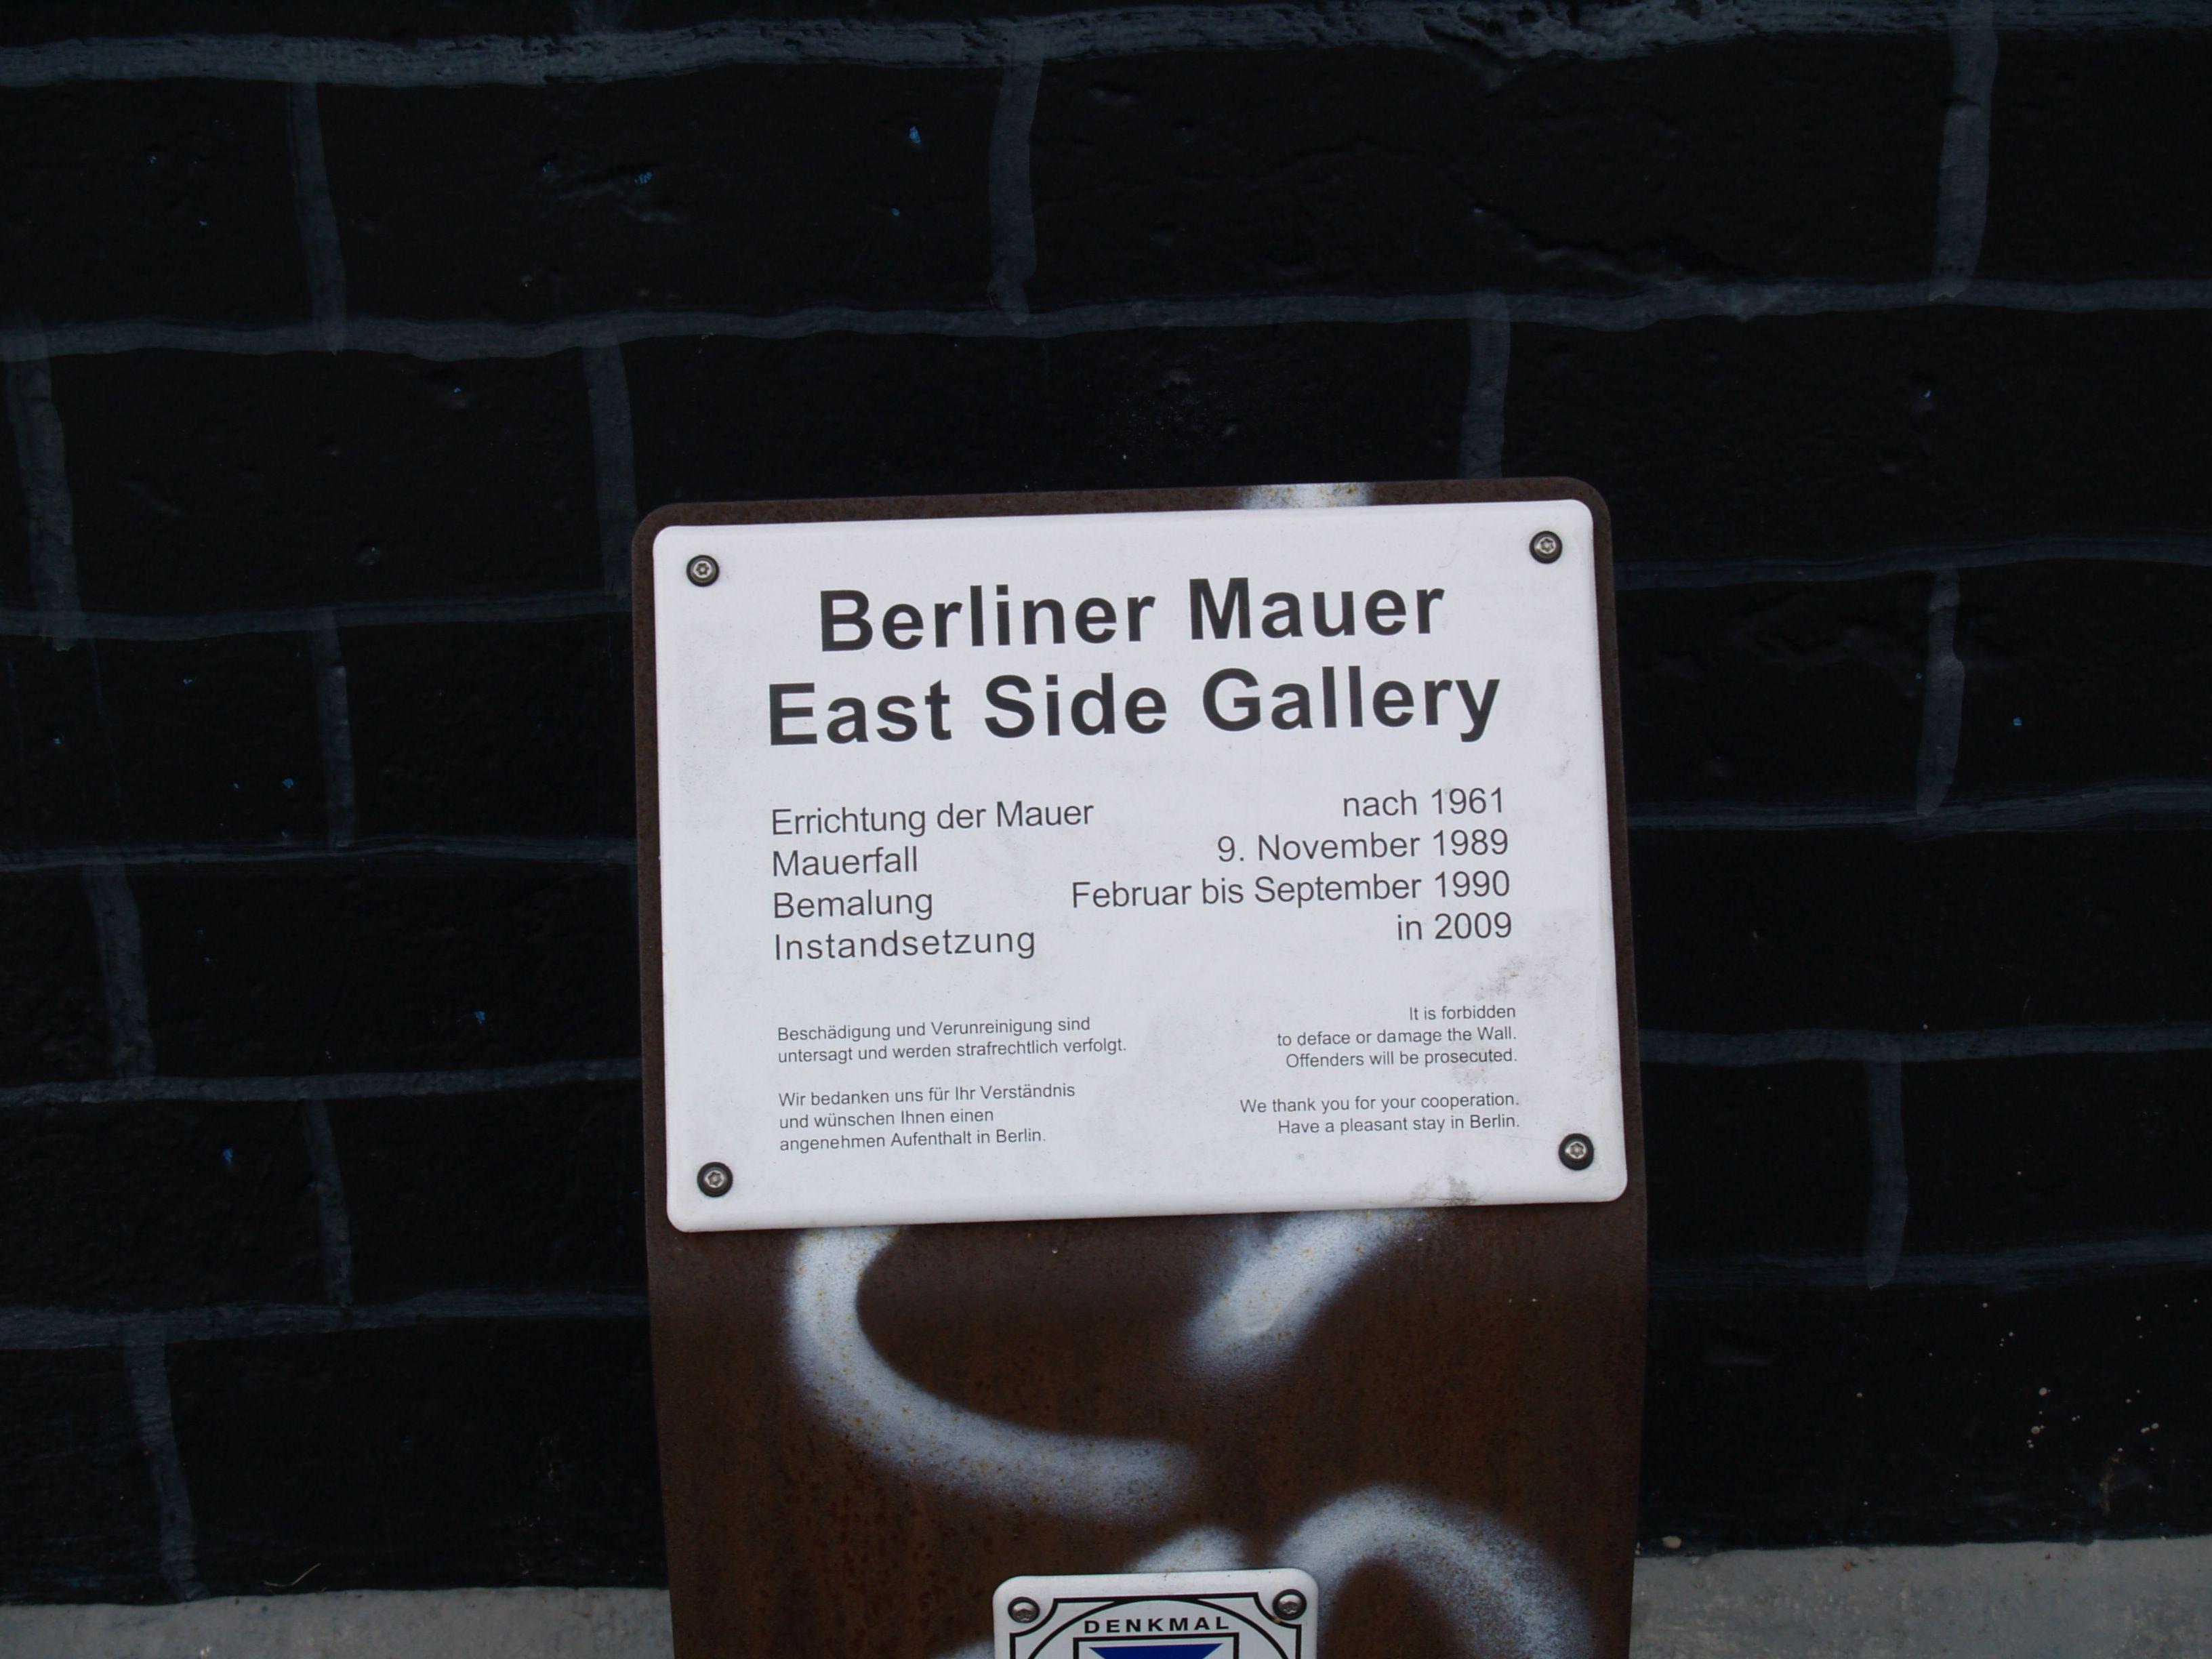 Berliner Mauer East Side Gallery Berliner Mauer Mauer Bilder